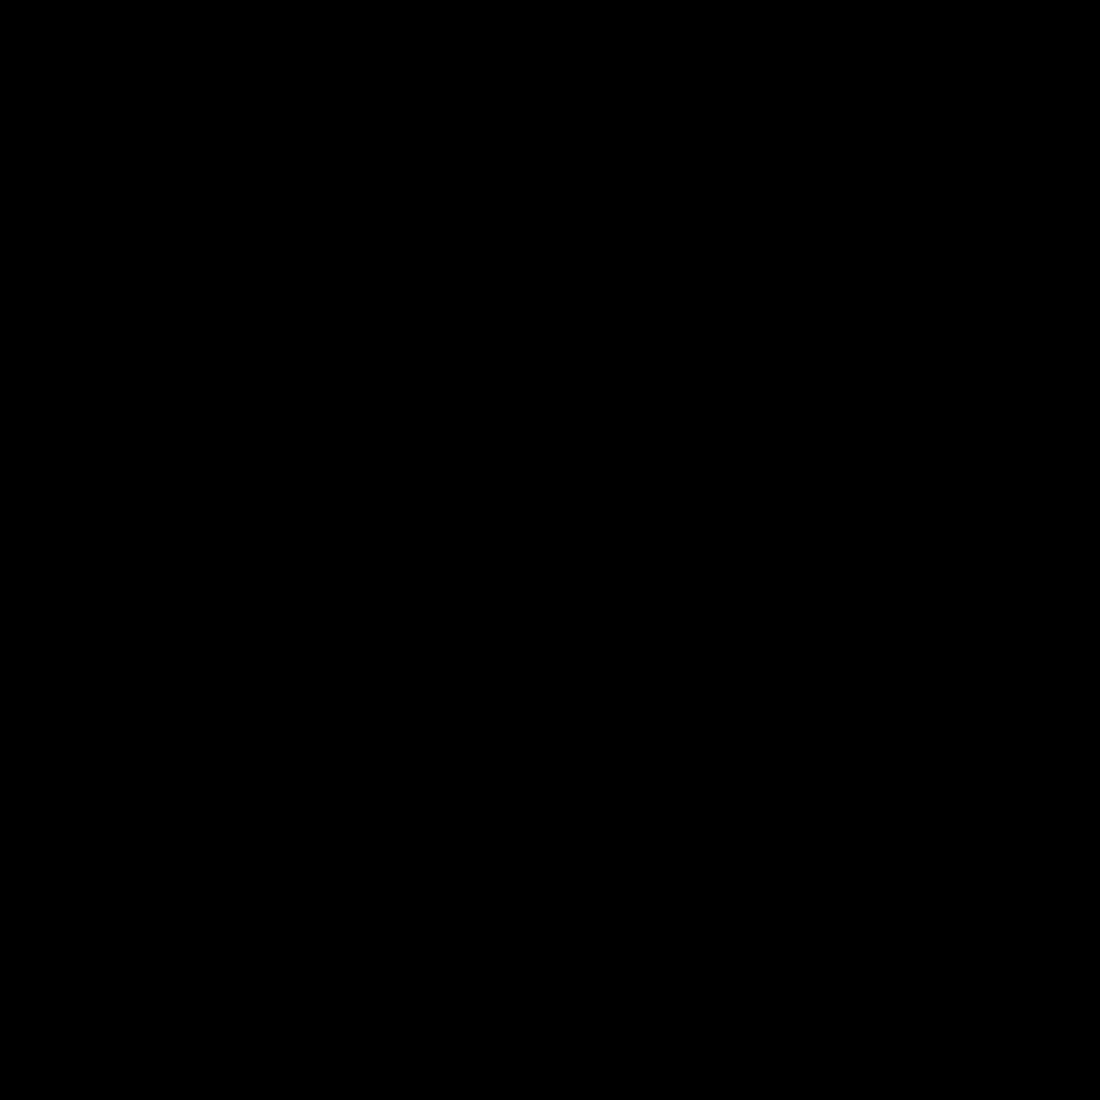 JBL EON208P АКТИВНАЯ АКУСТИКА ДЛЯ БАРОВ, КЛУБОВ, КАФЕ, ДЛЯ ПОМЕЩЕНИЯ ДО 70М2